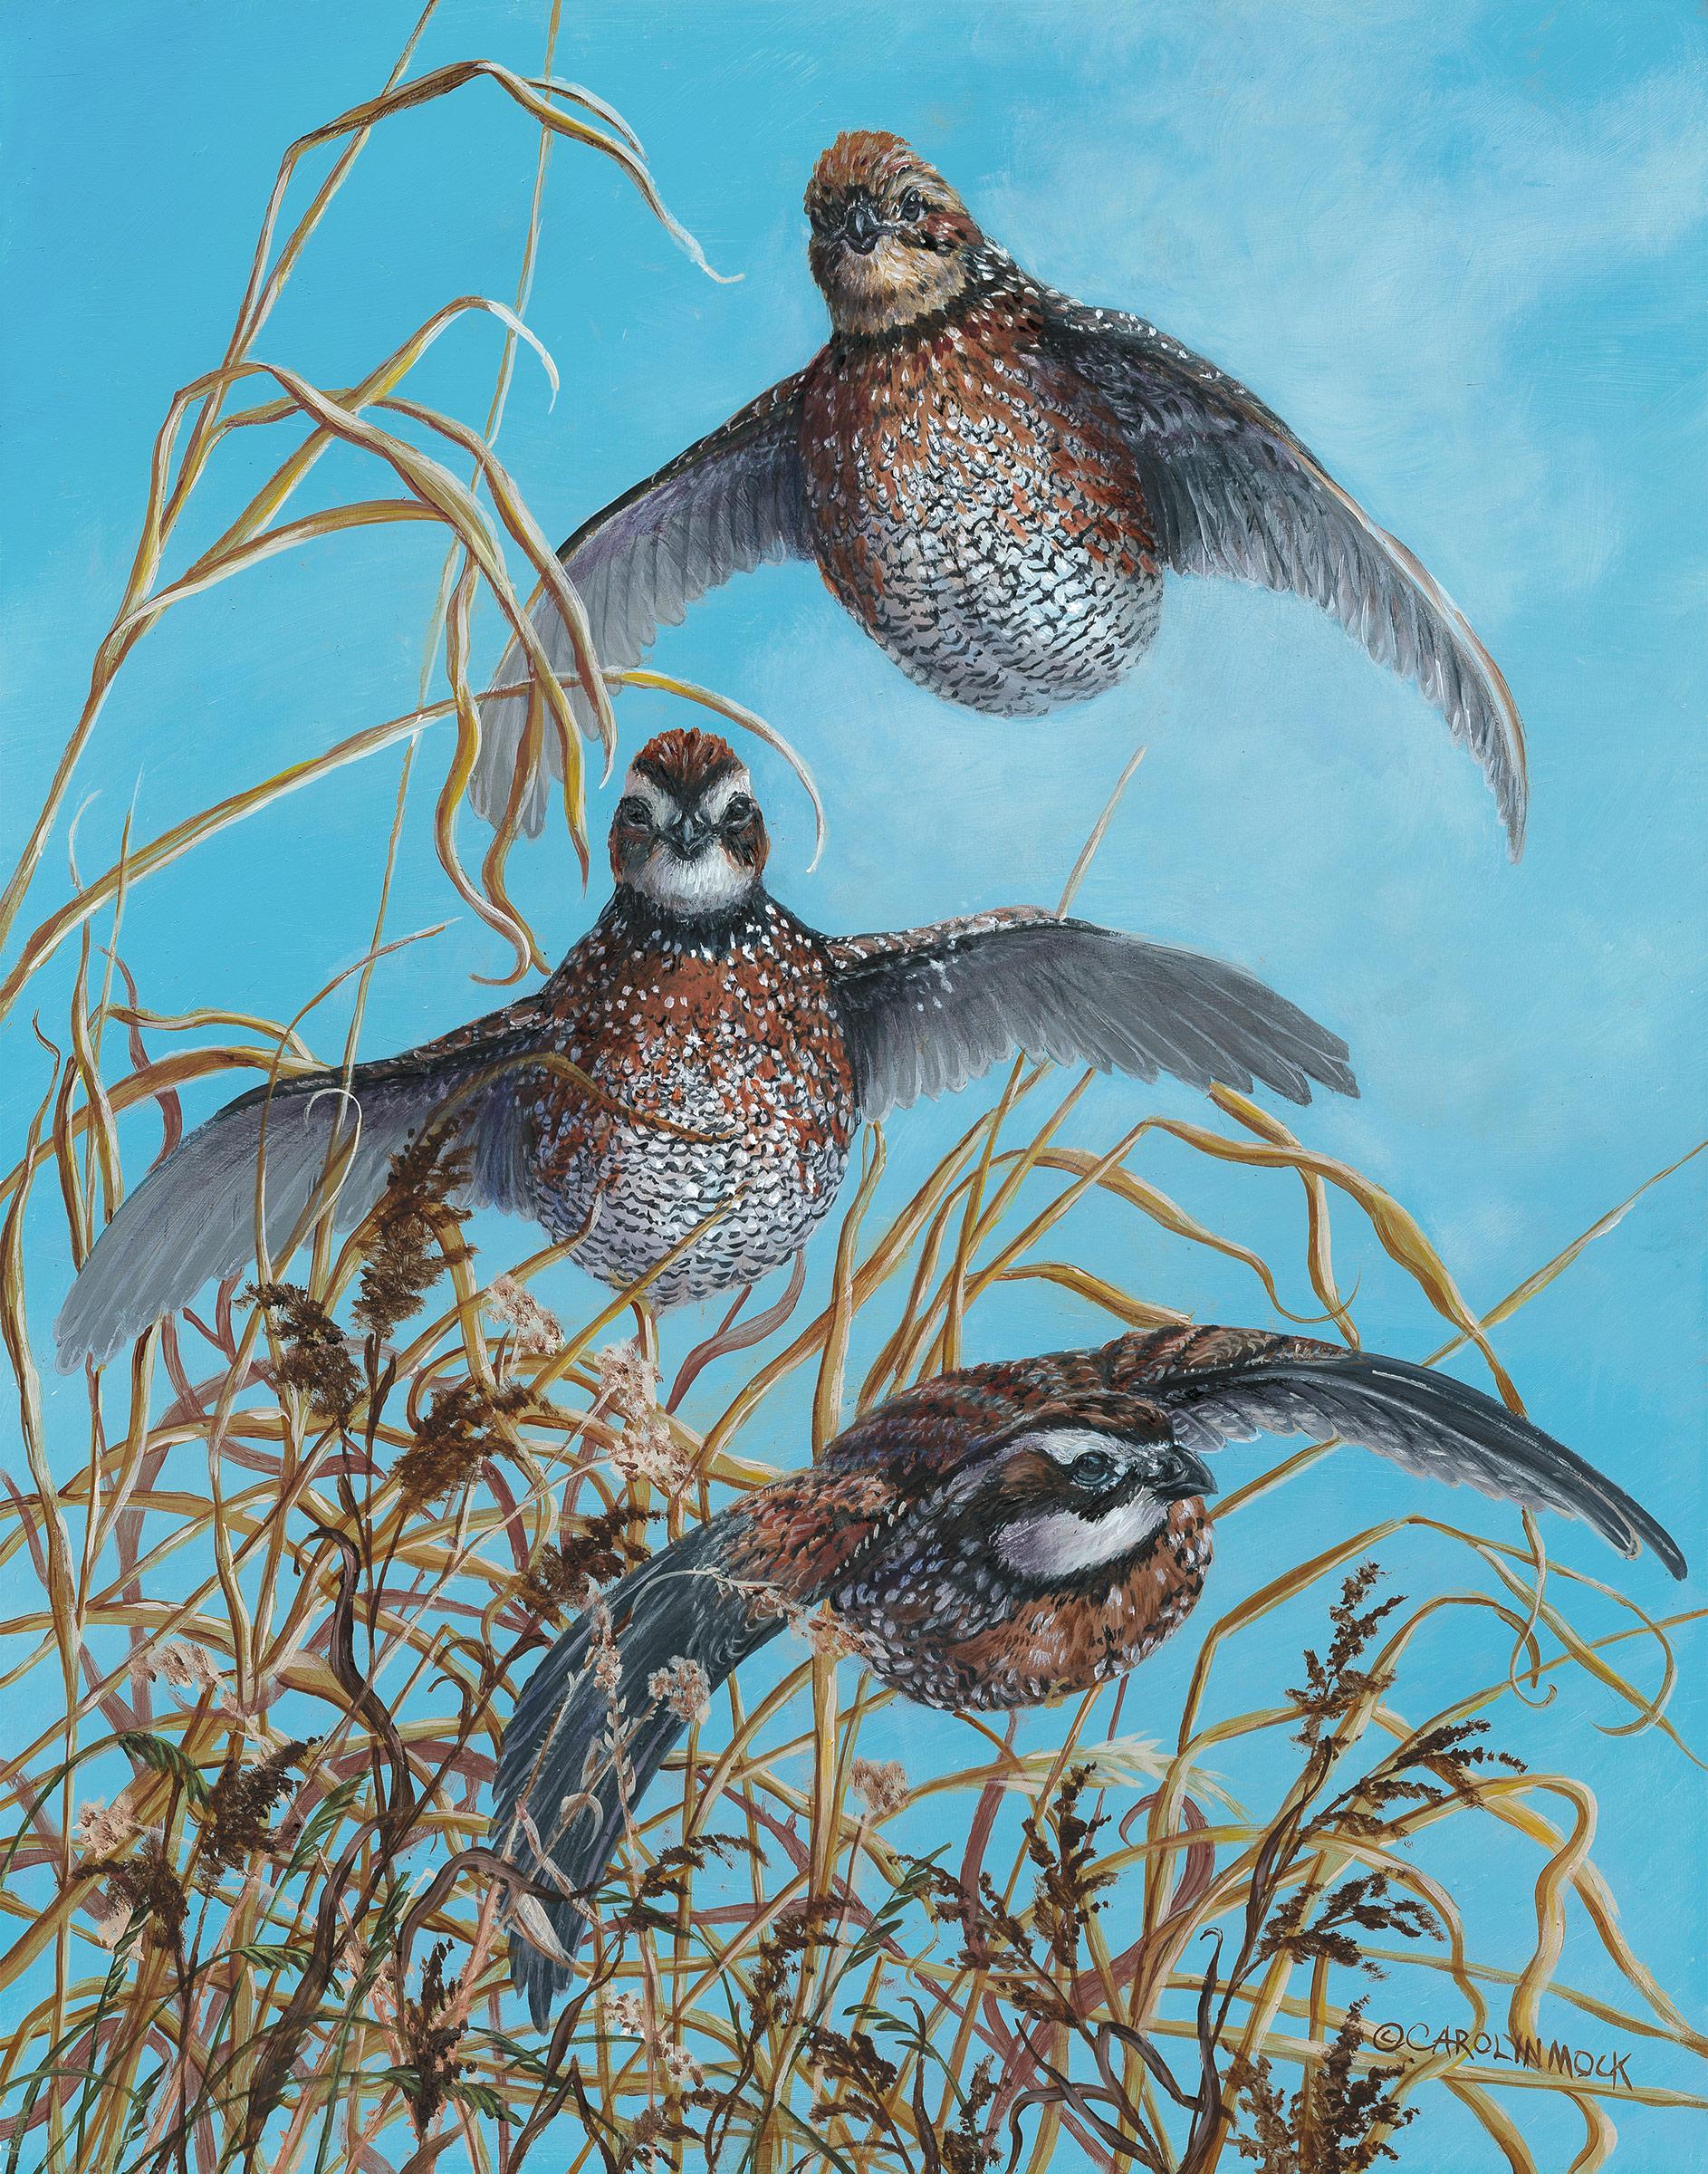 Three birds take flight from a field of grass